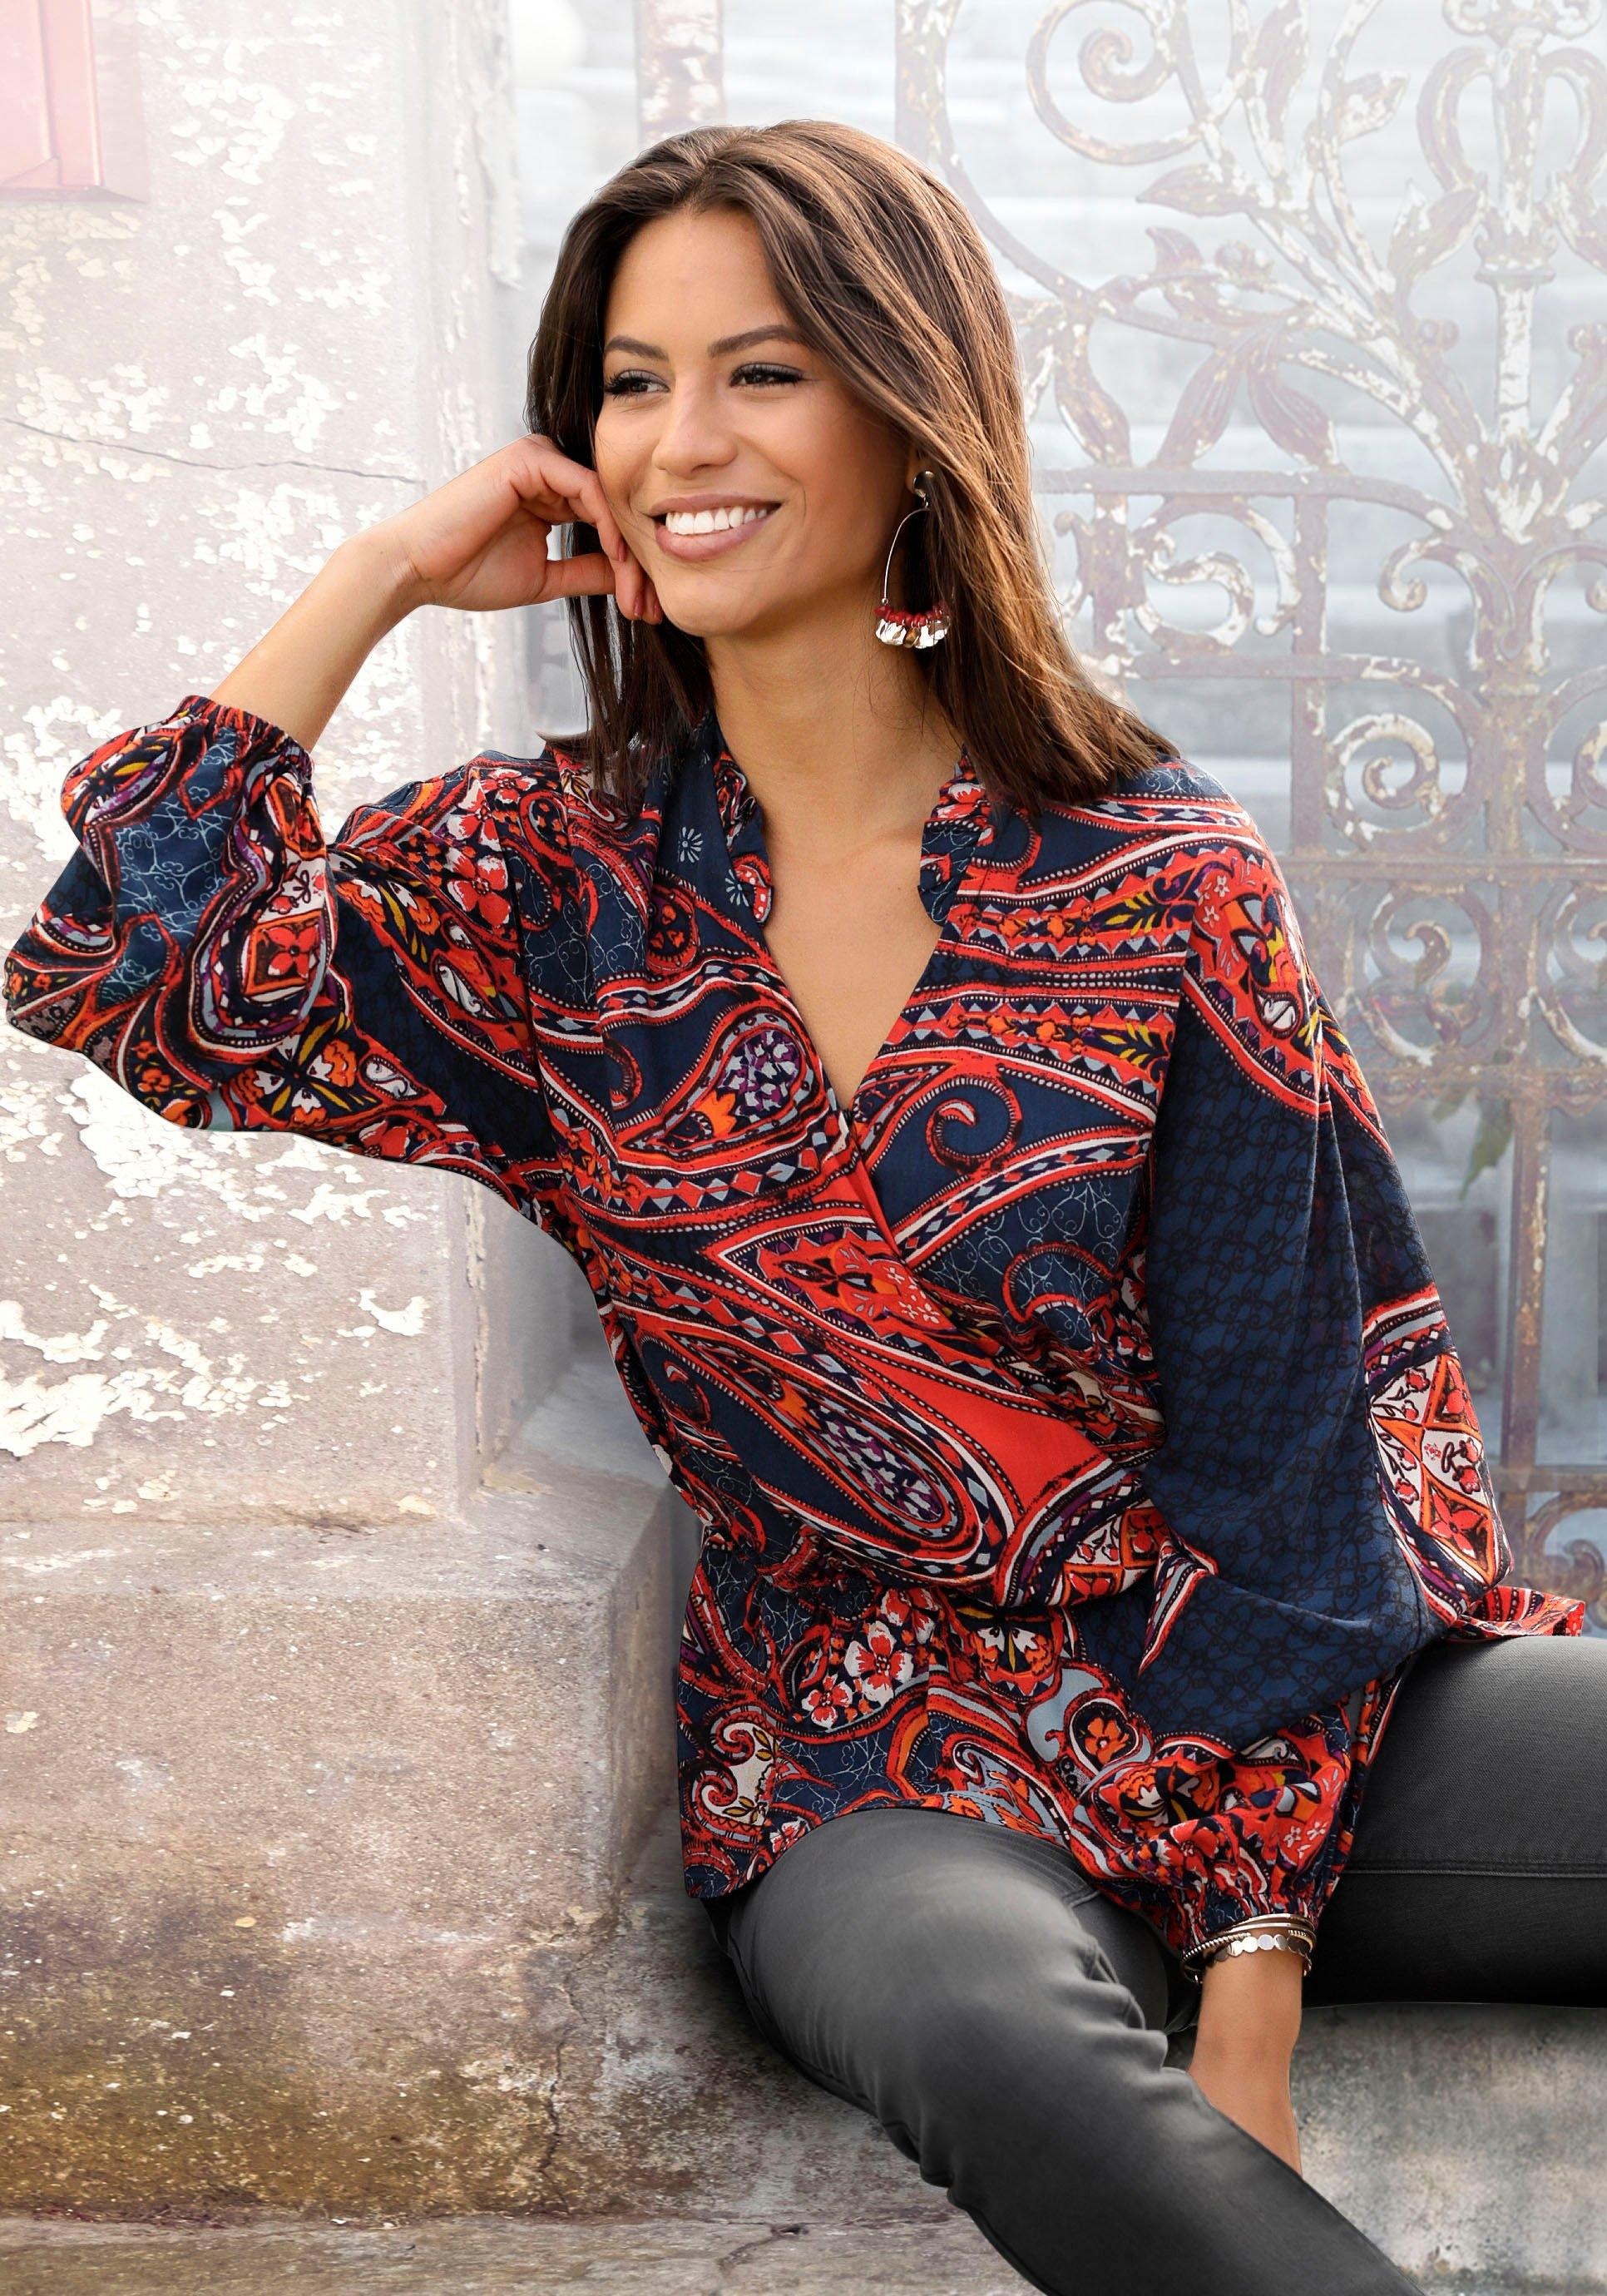 LASCANA gedessineerde blouse voordelig en veilig online kopen